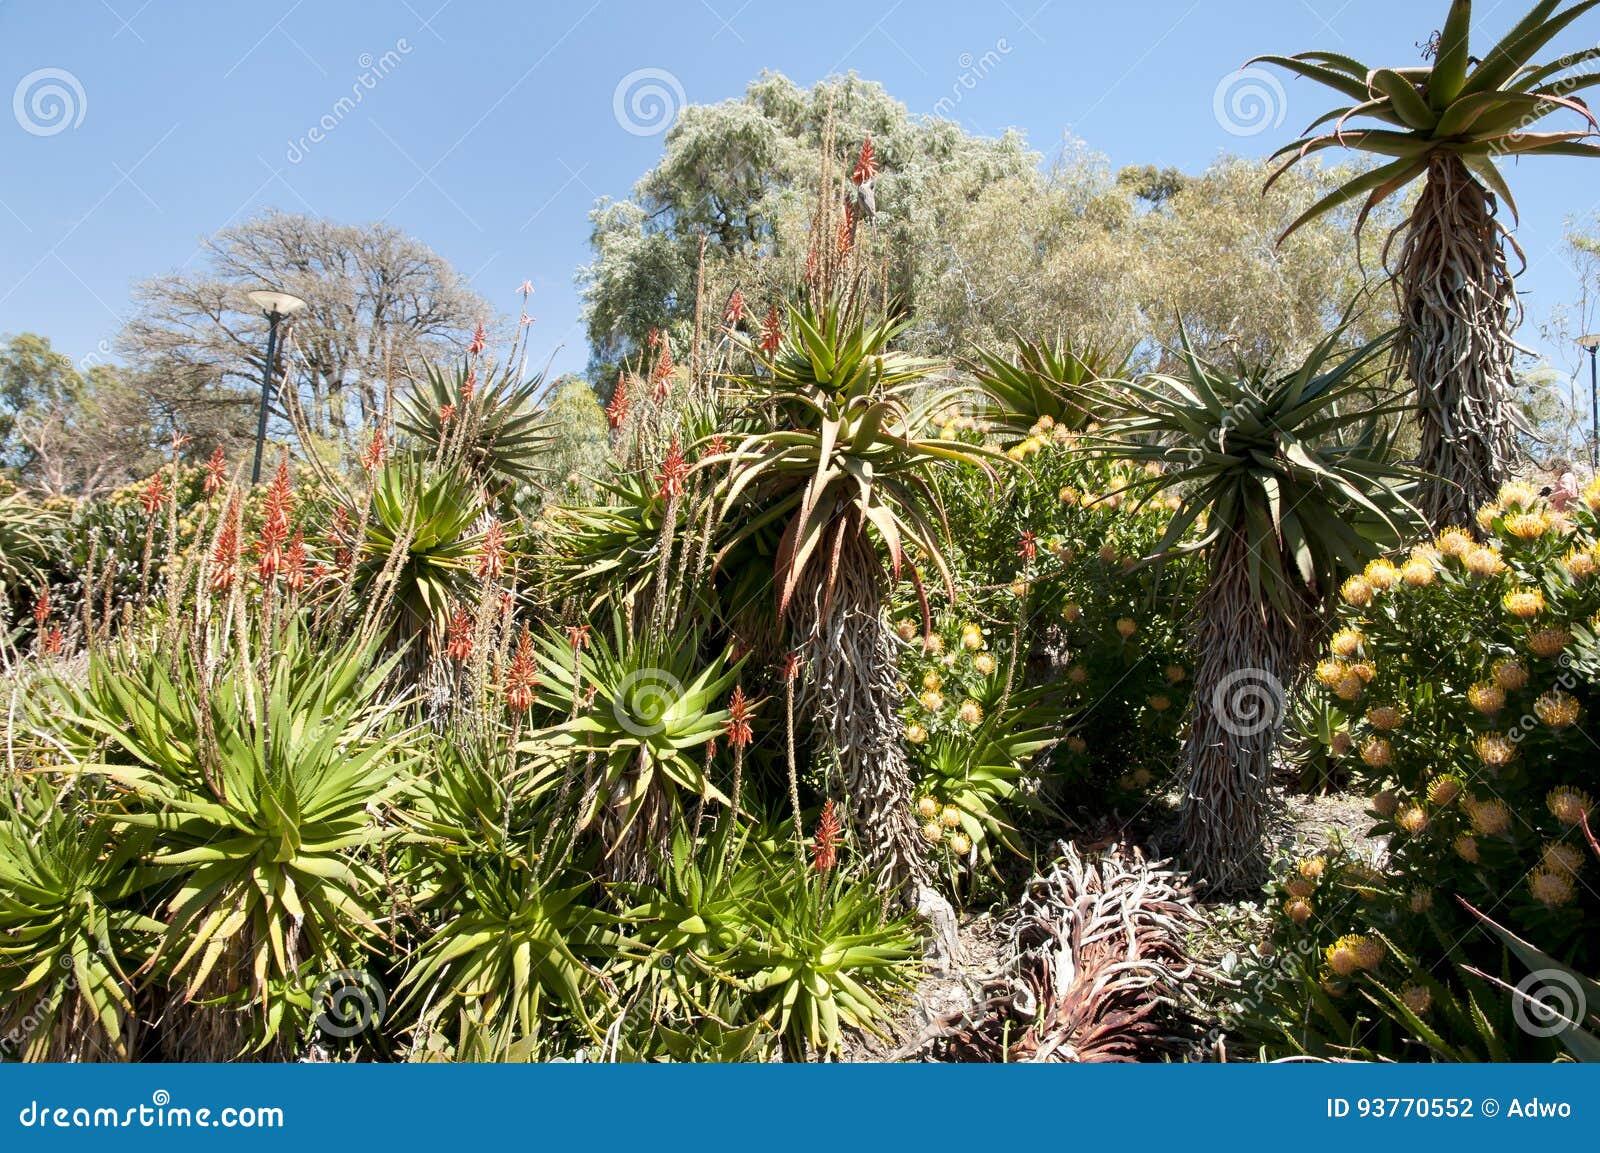 Reyes Park - Perth - Australia